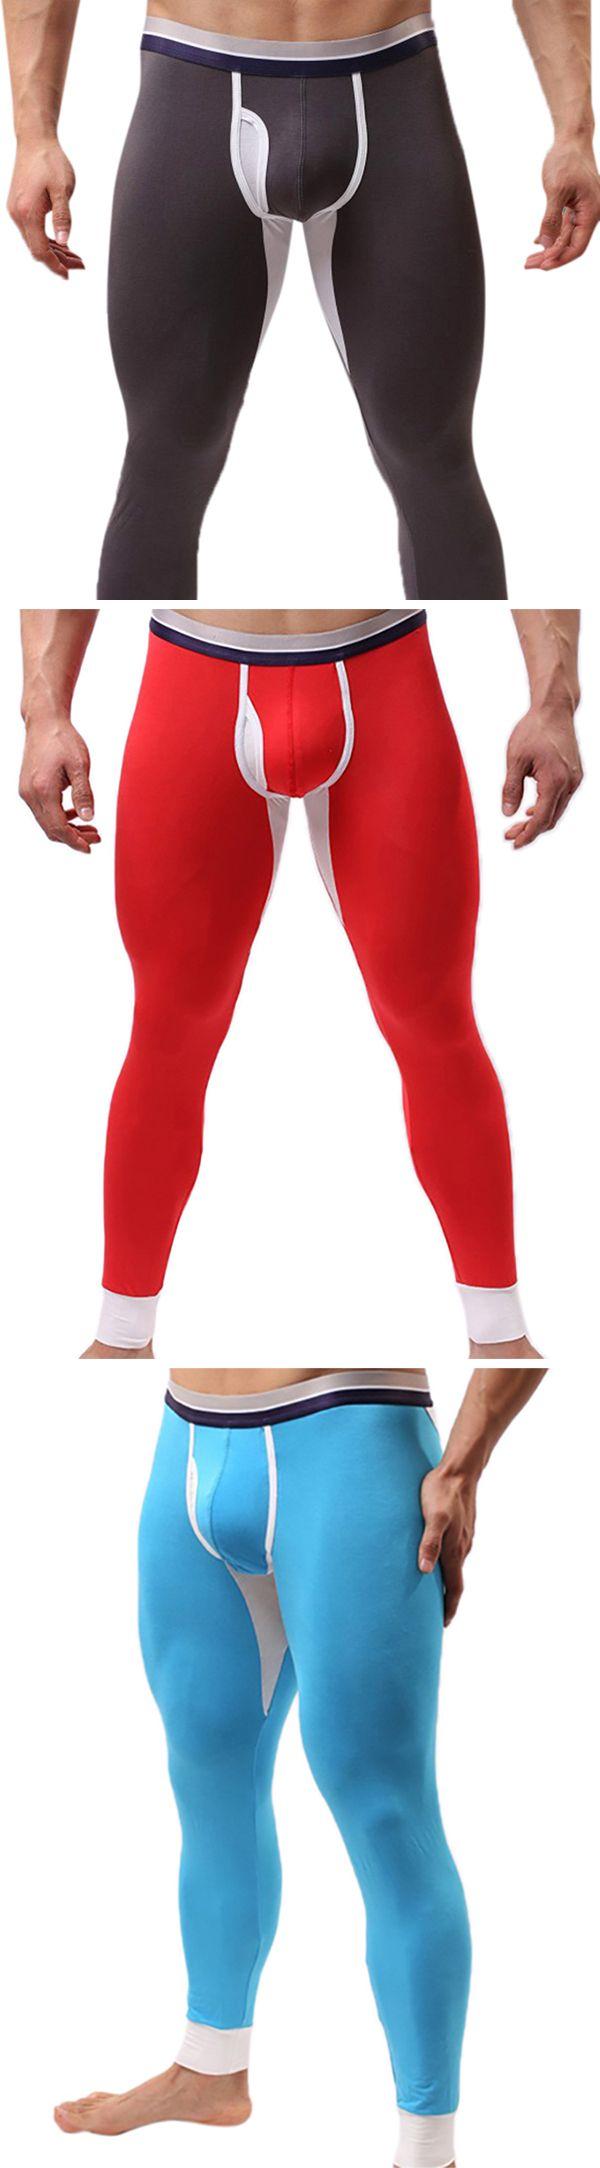 Winter Outfit�� Casual Long Johns/Modal Outdoor Underwear #men #menswear